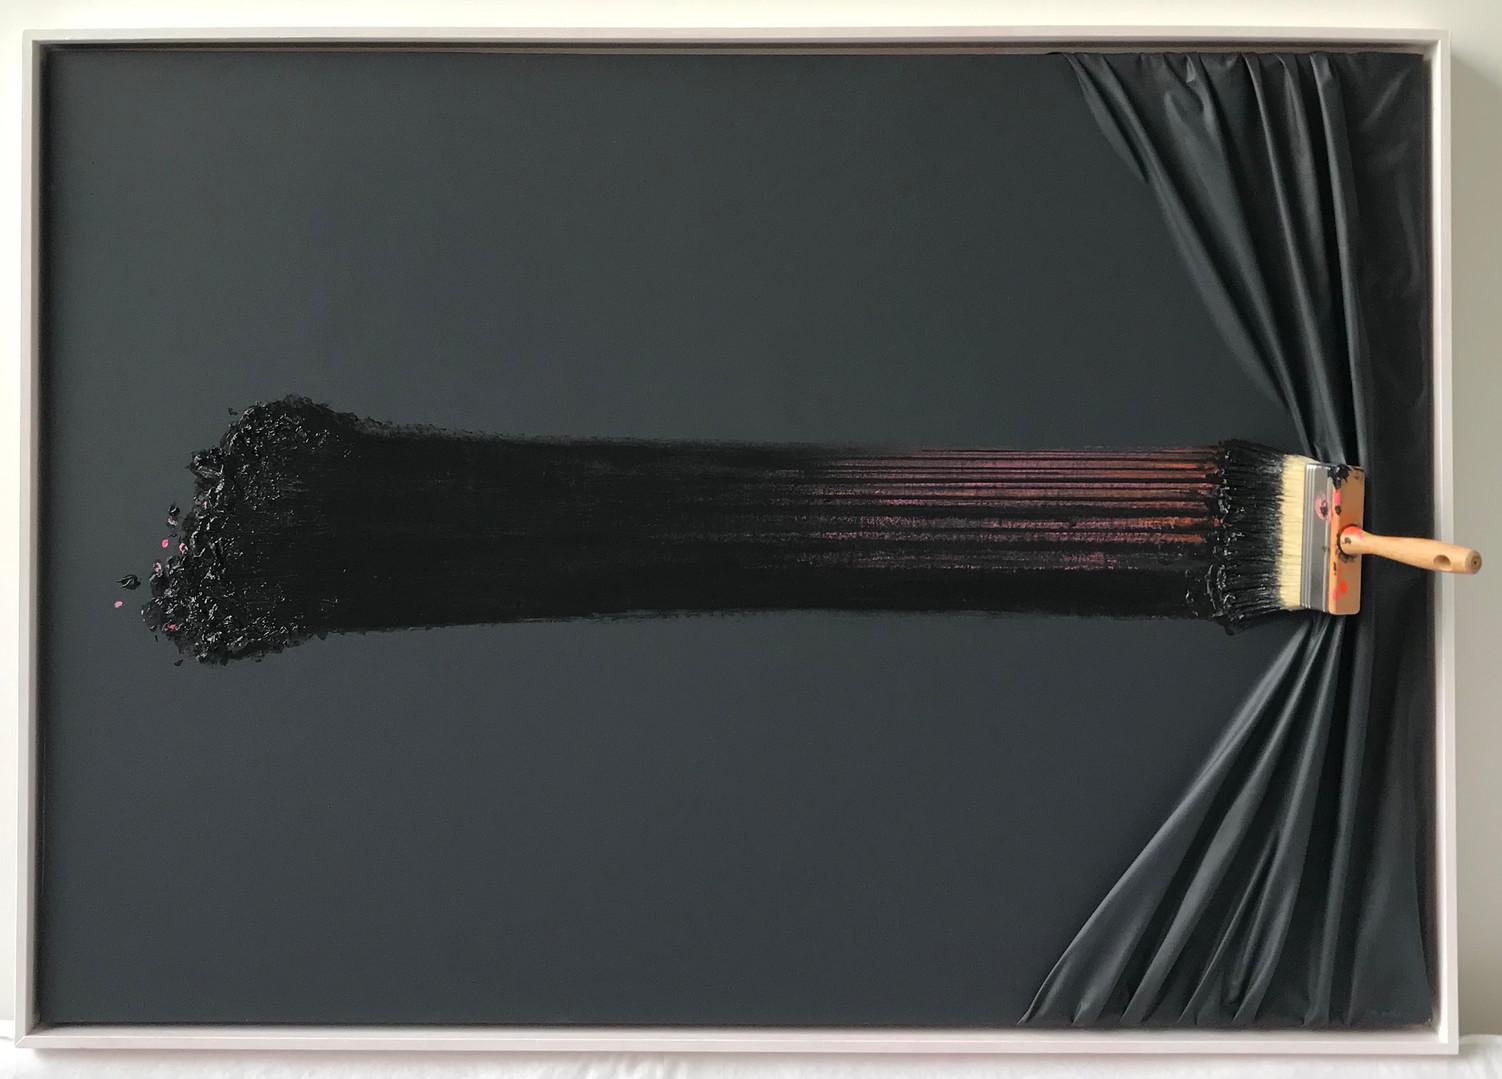 jean-paul-donadini-brosse-arretee-black.